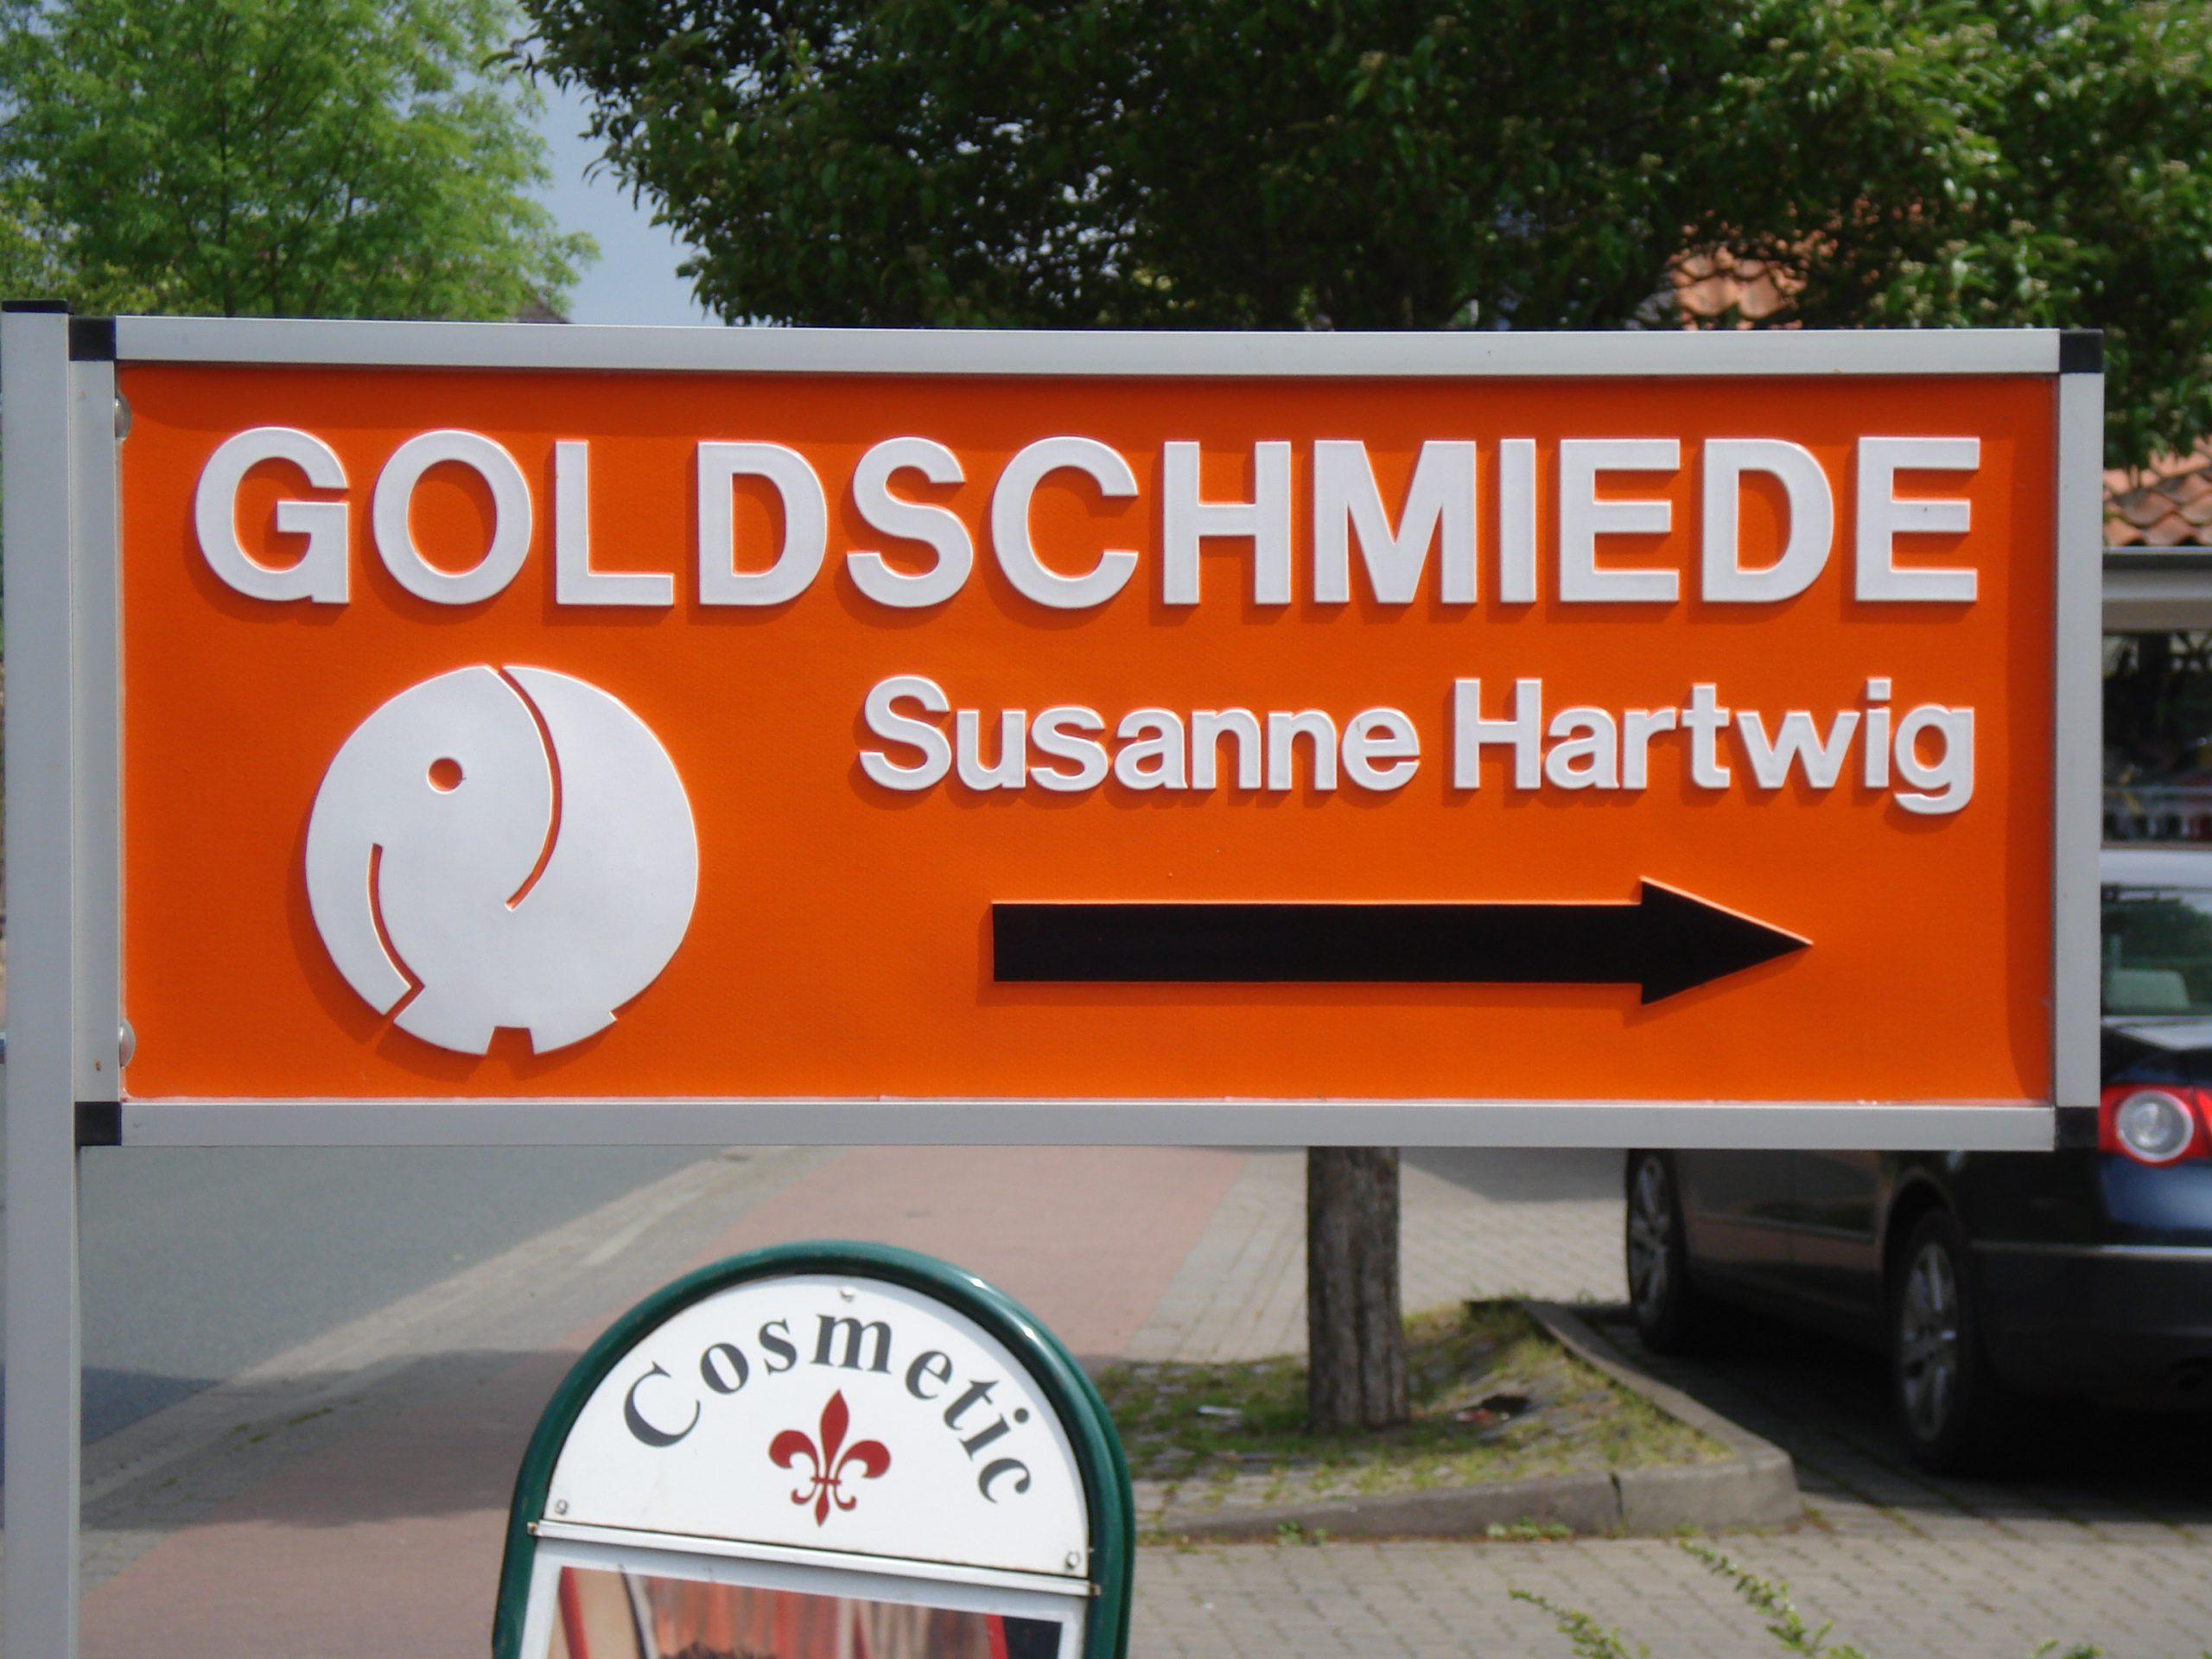 Wegweiser Goldschmiede Susanne Hartwig